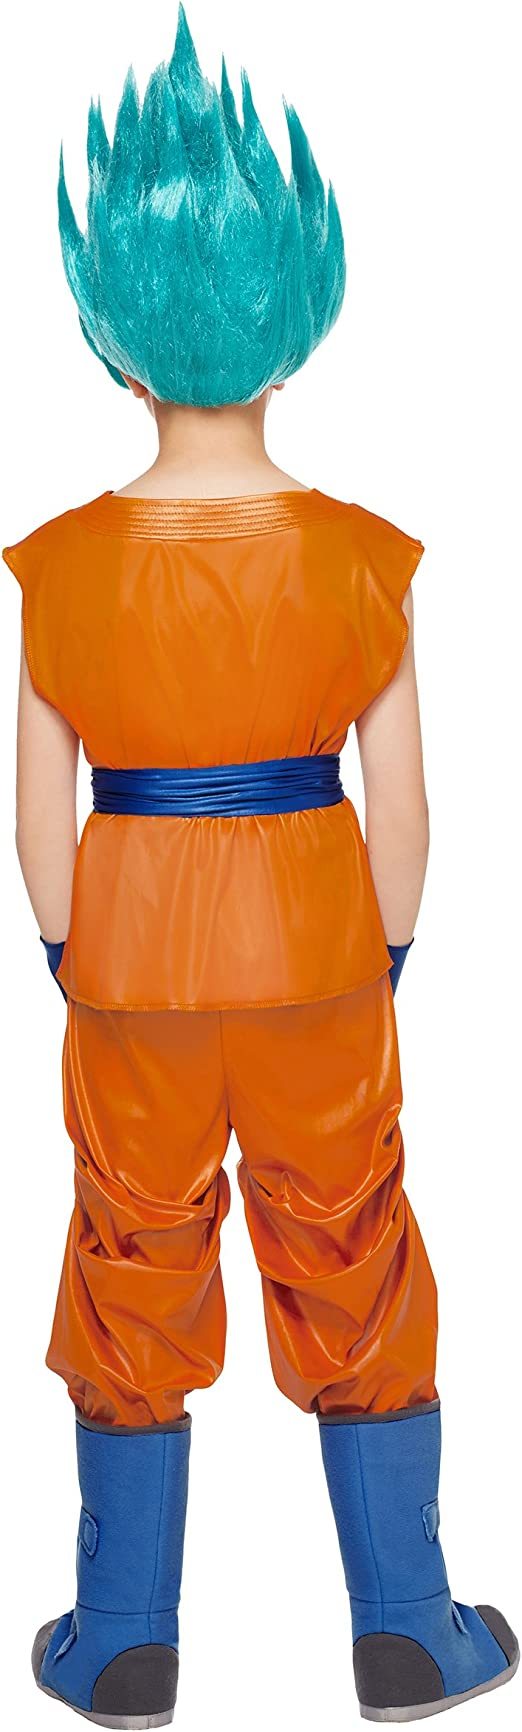 Amazon.com: Espíritu de Halloween Costume Kids Goku – Dragon ...